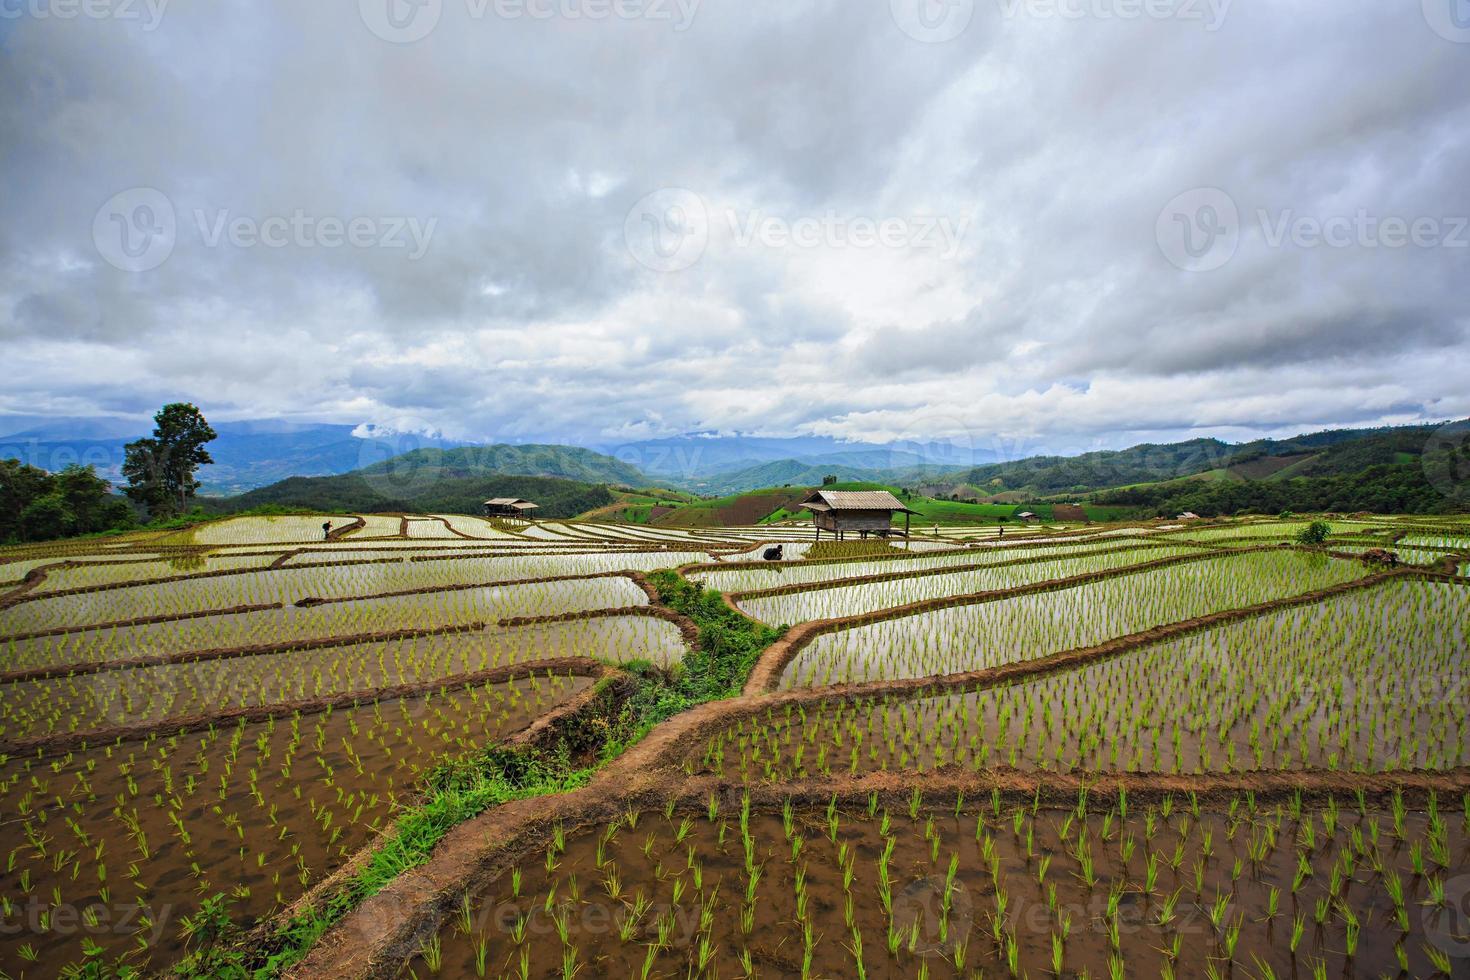 campos de arroz, papongpieng, chiang mai, tailandia. foto